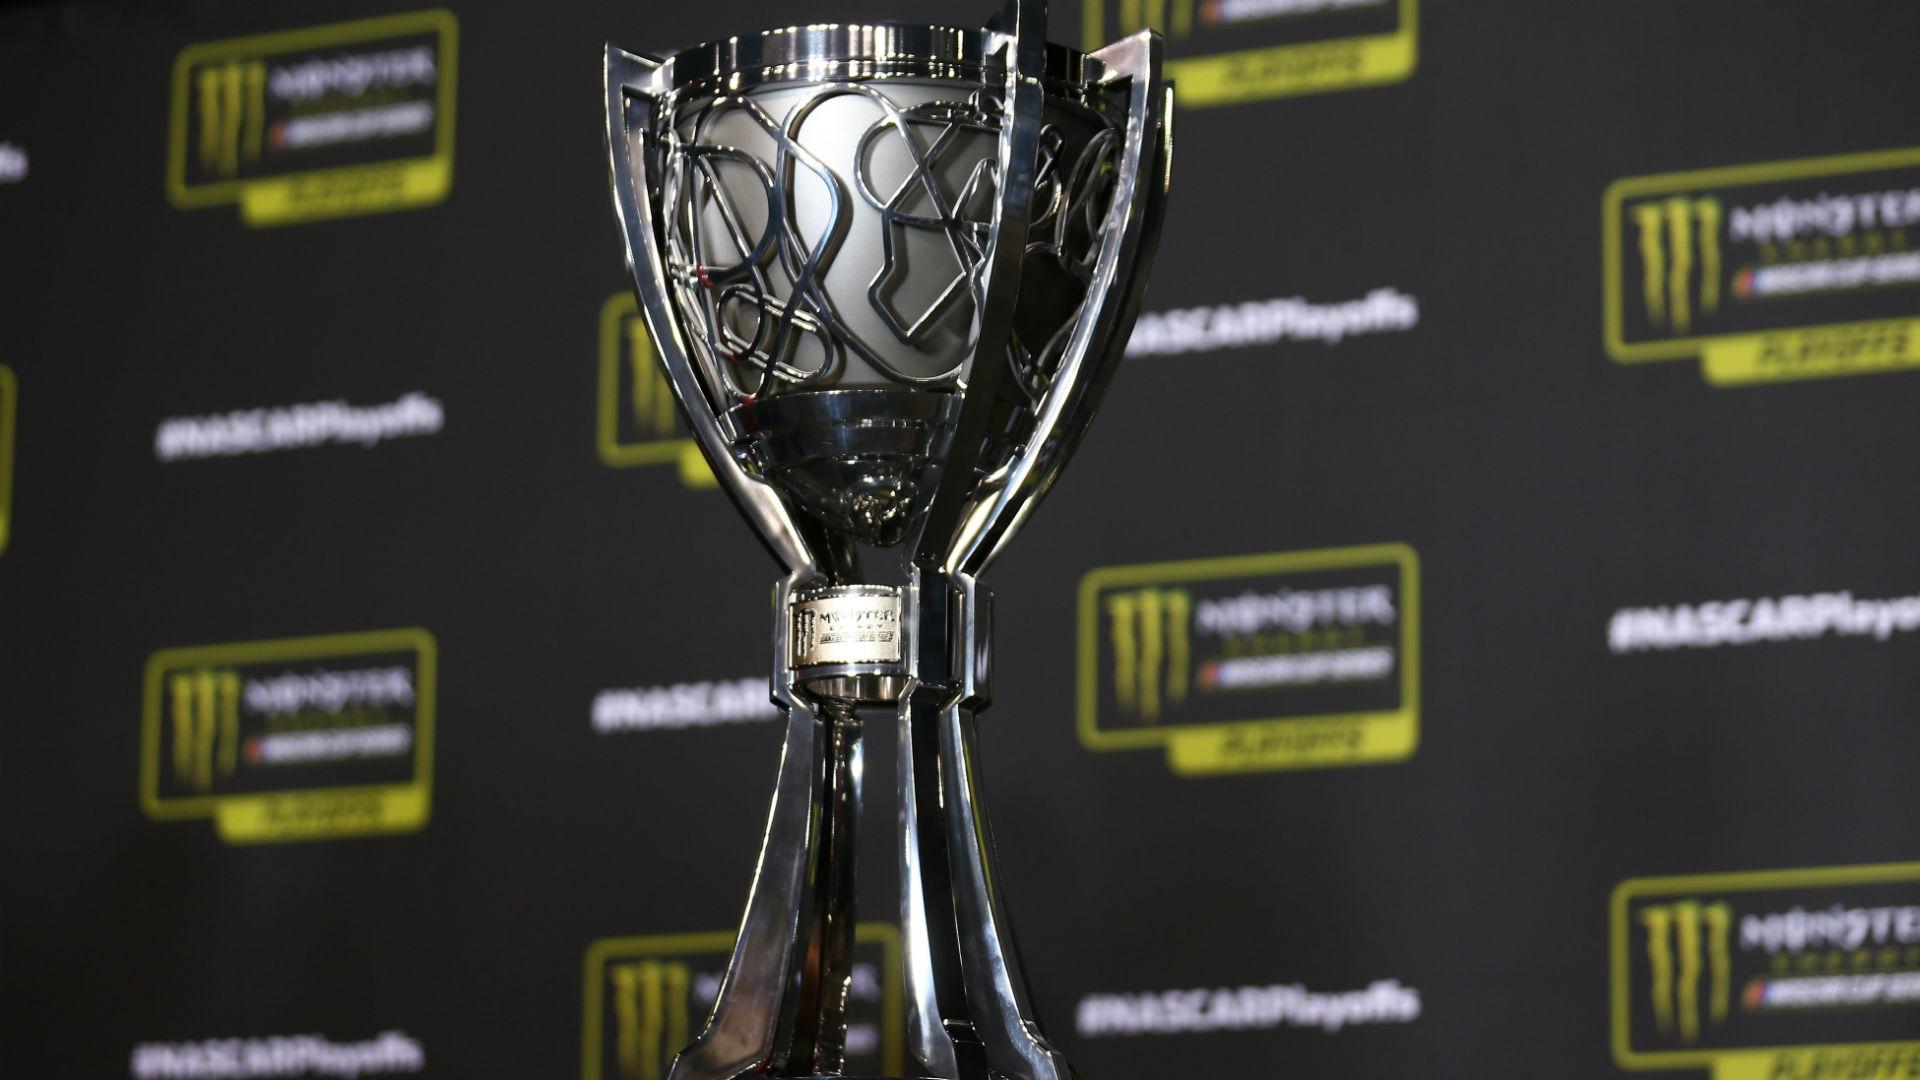 nascar-championship-trophy_190j7hqimkdd91tlgnq6ugi9mt